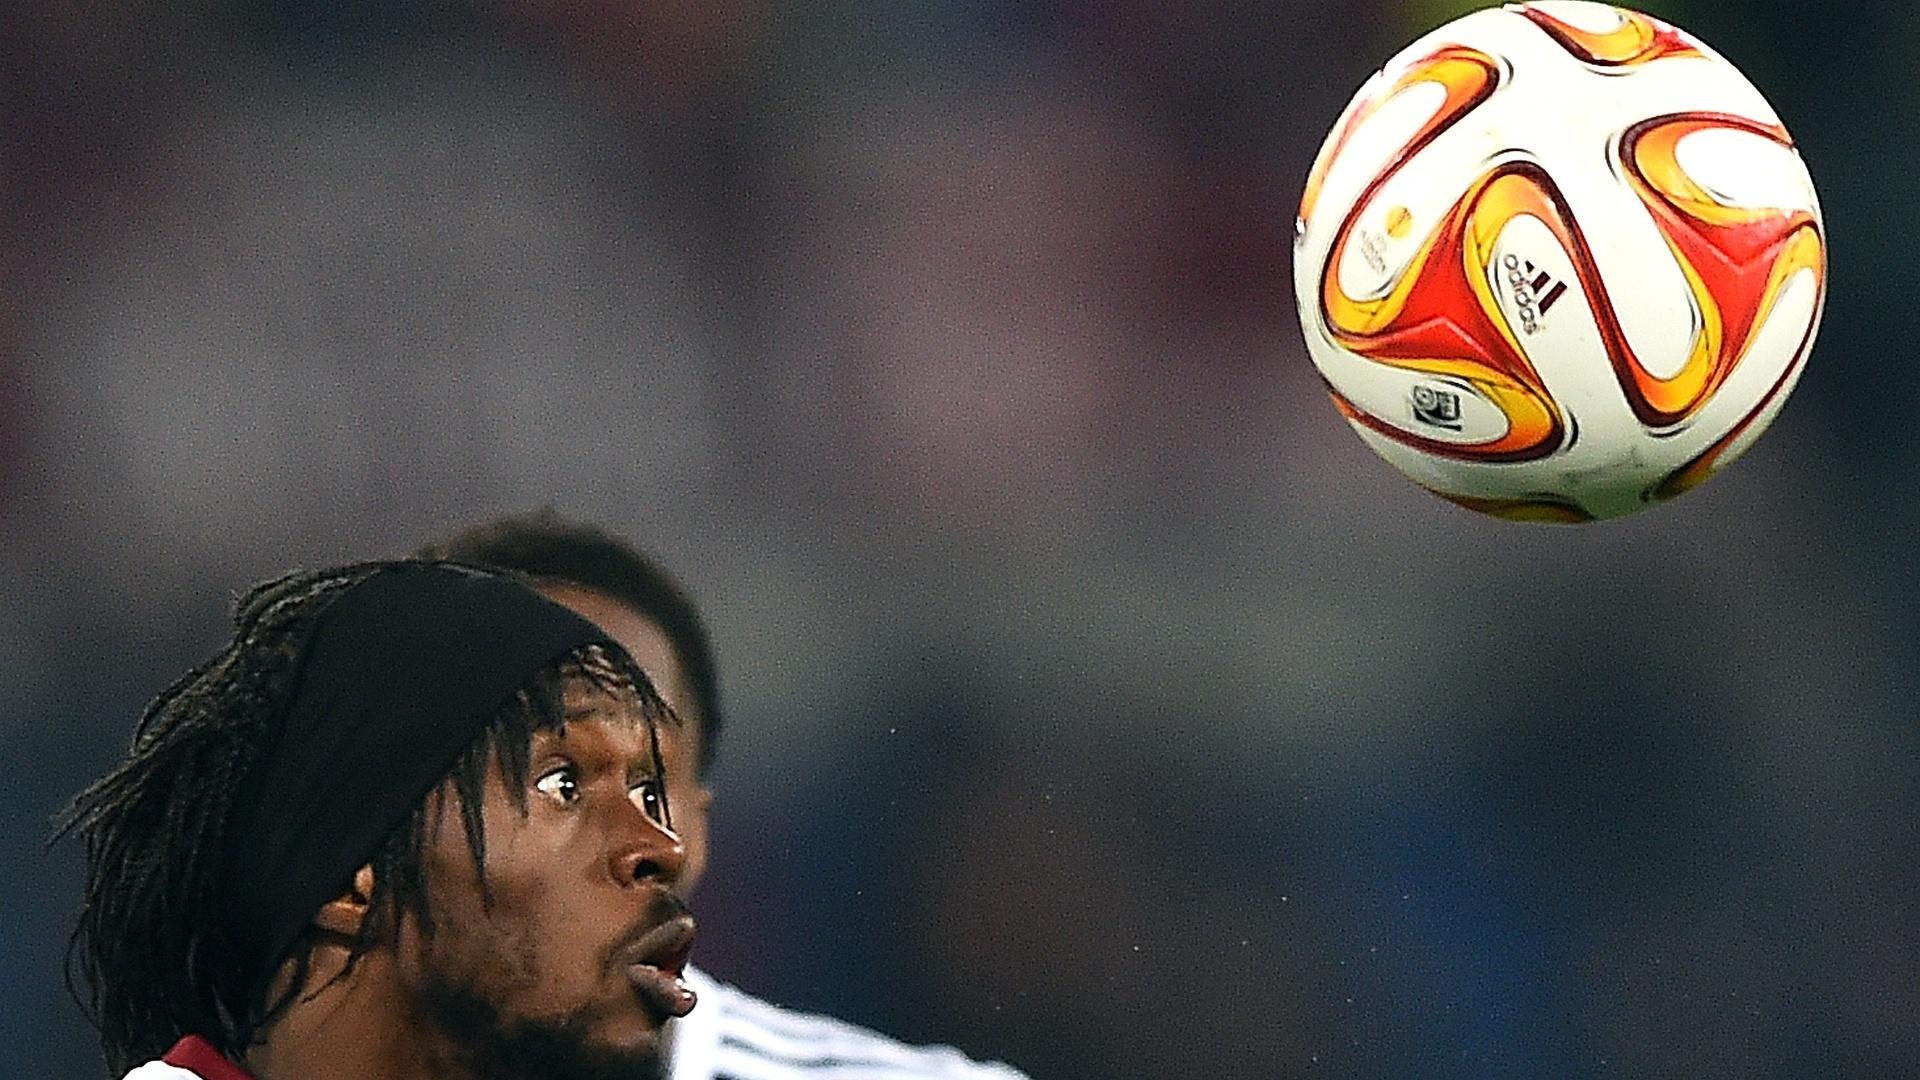 Gervinho atento no lance contra o Feyenoord. Atacante foi o autor do gol da Roma